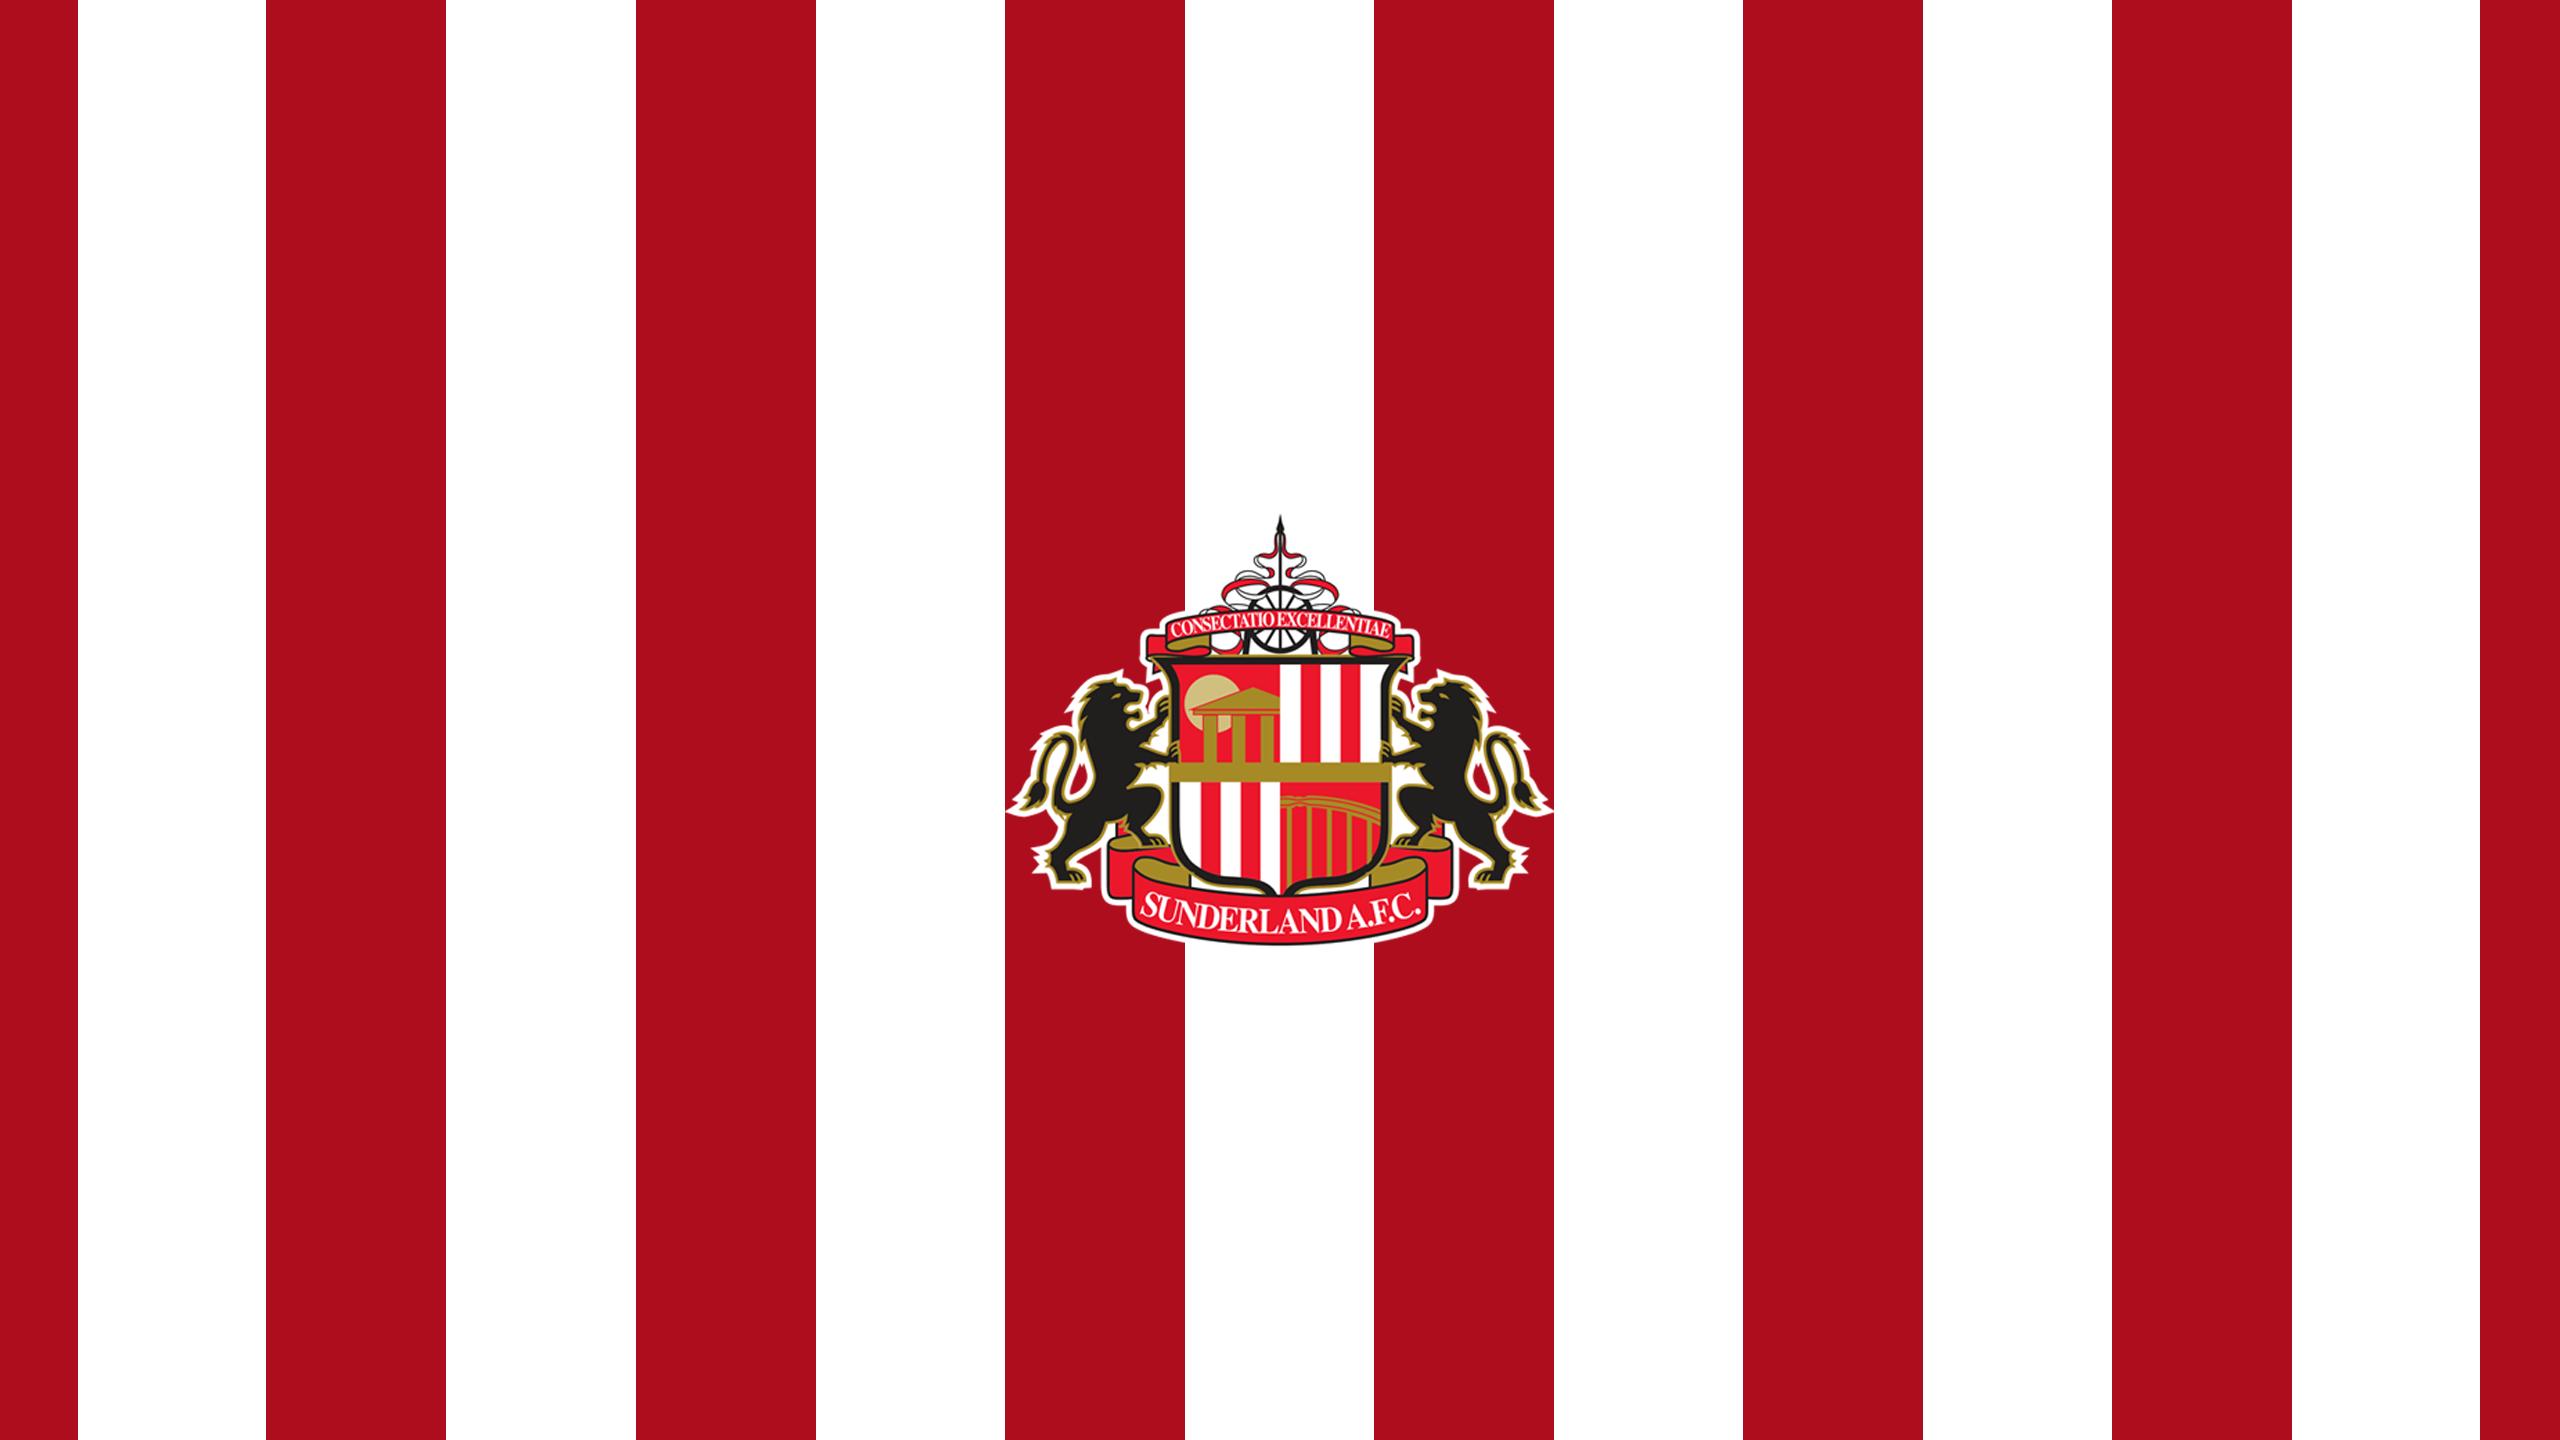 Sunderland FC